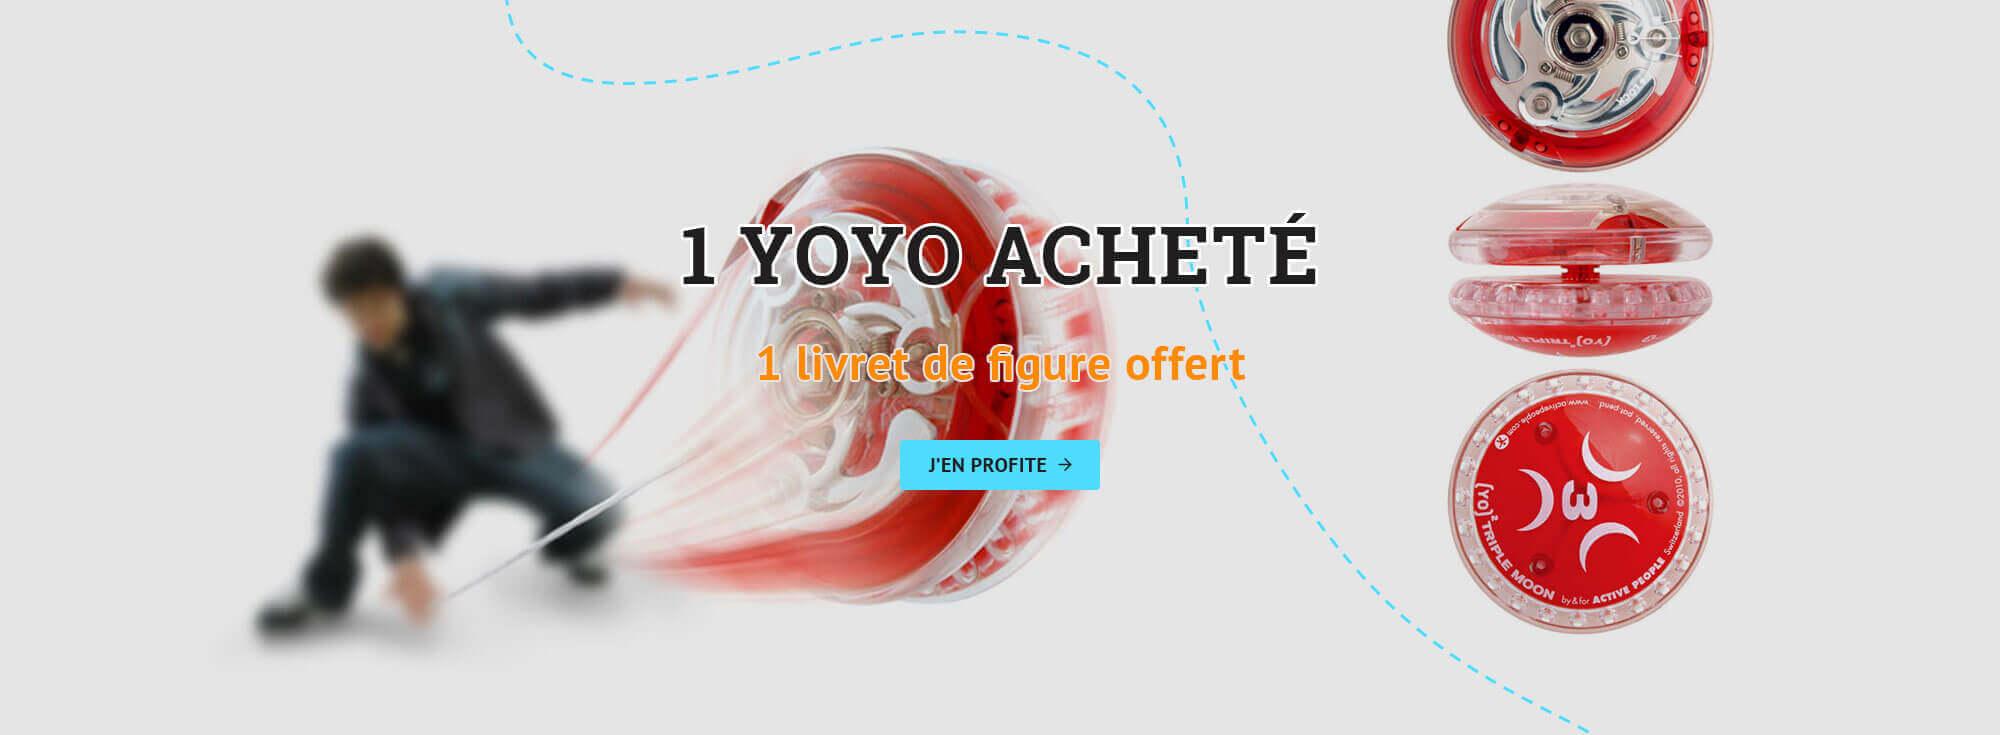 1 yoyo acheté = 1 livret de figures offert